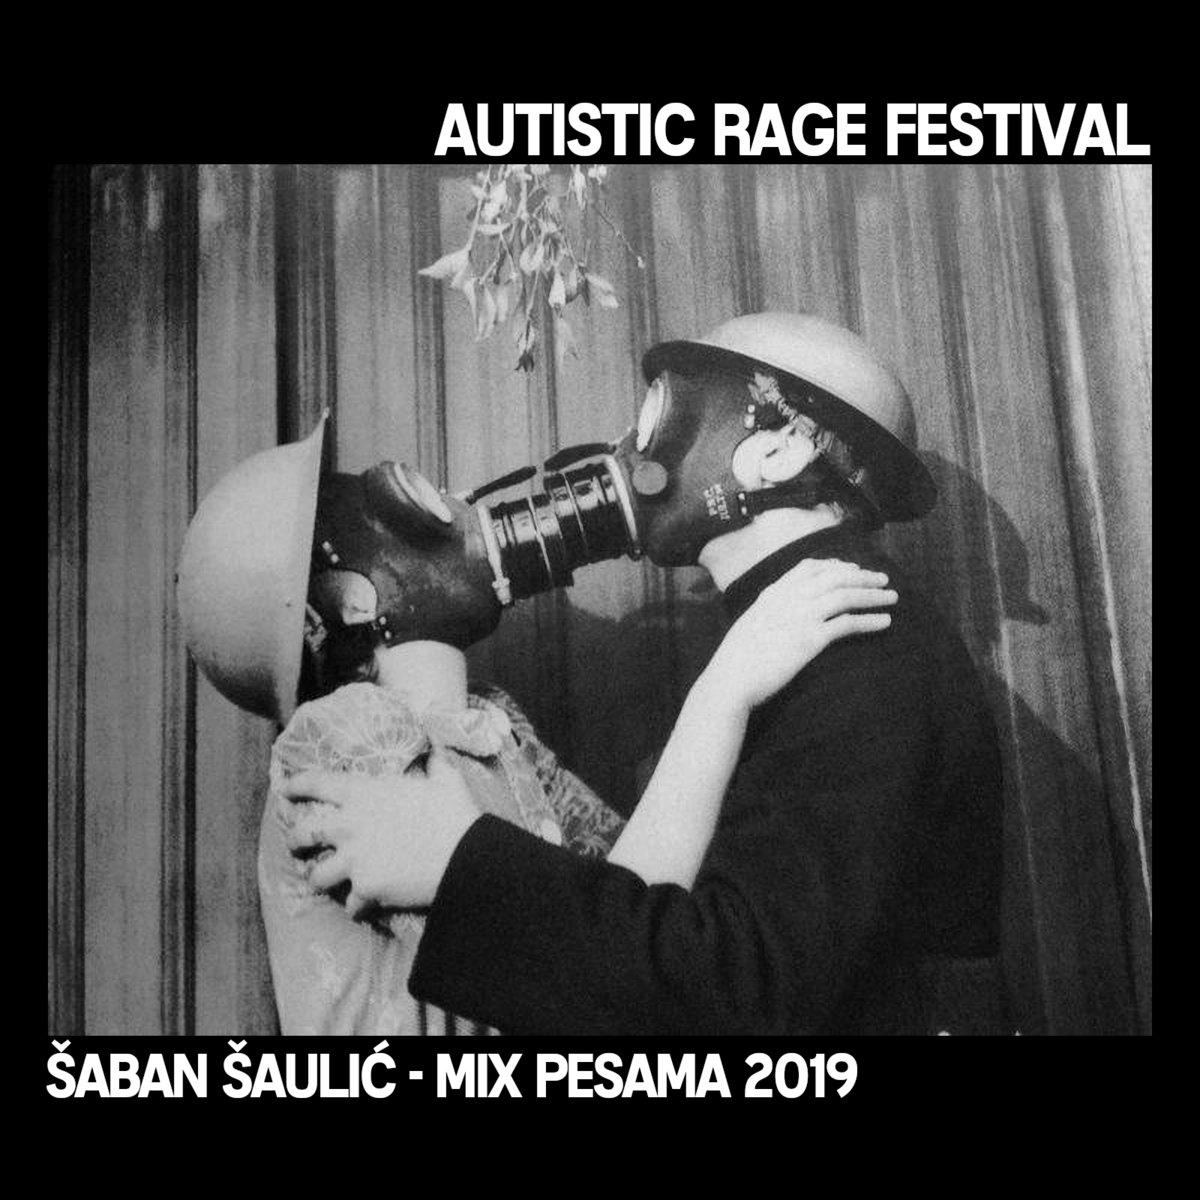 314Chan Šaban Šaulić - mix pesama 2019 | autistic rage festival 2